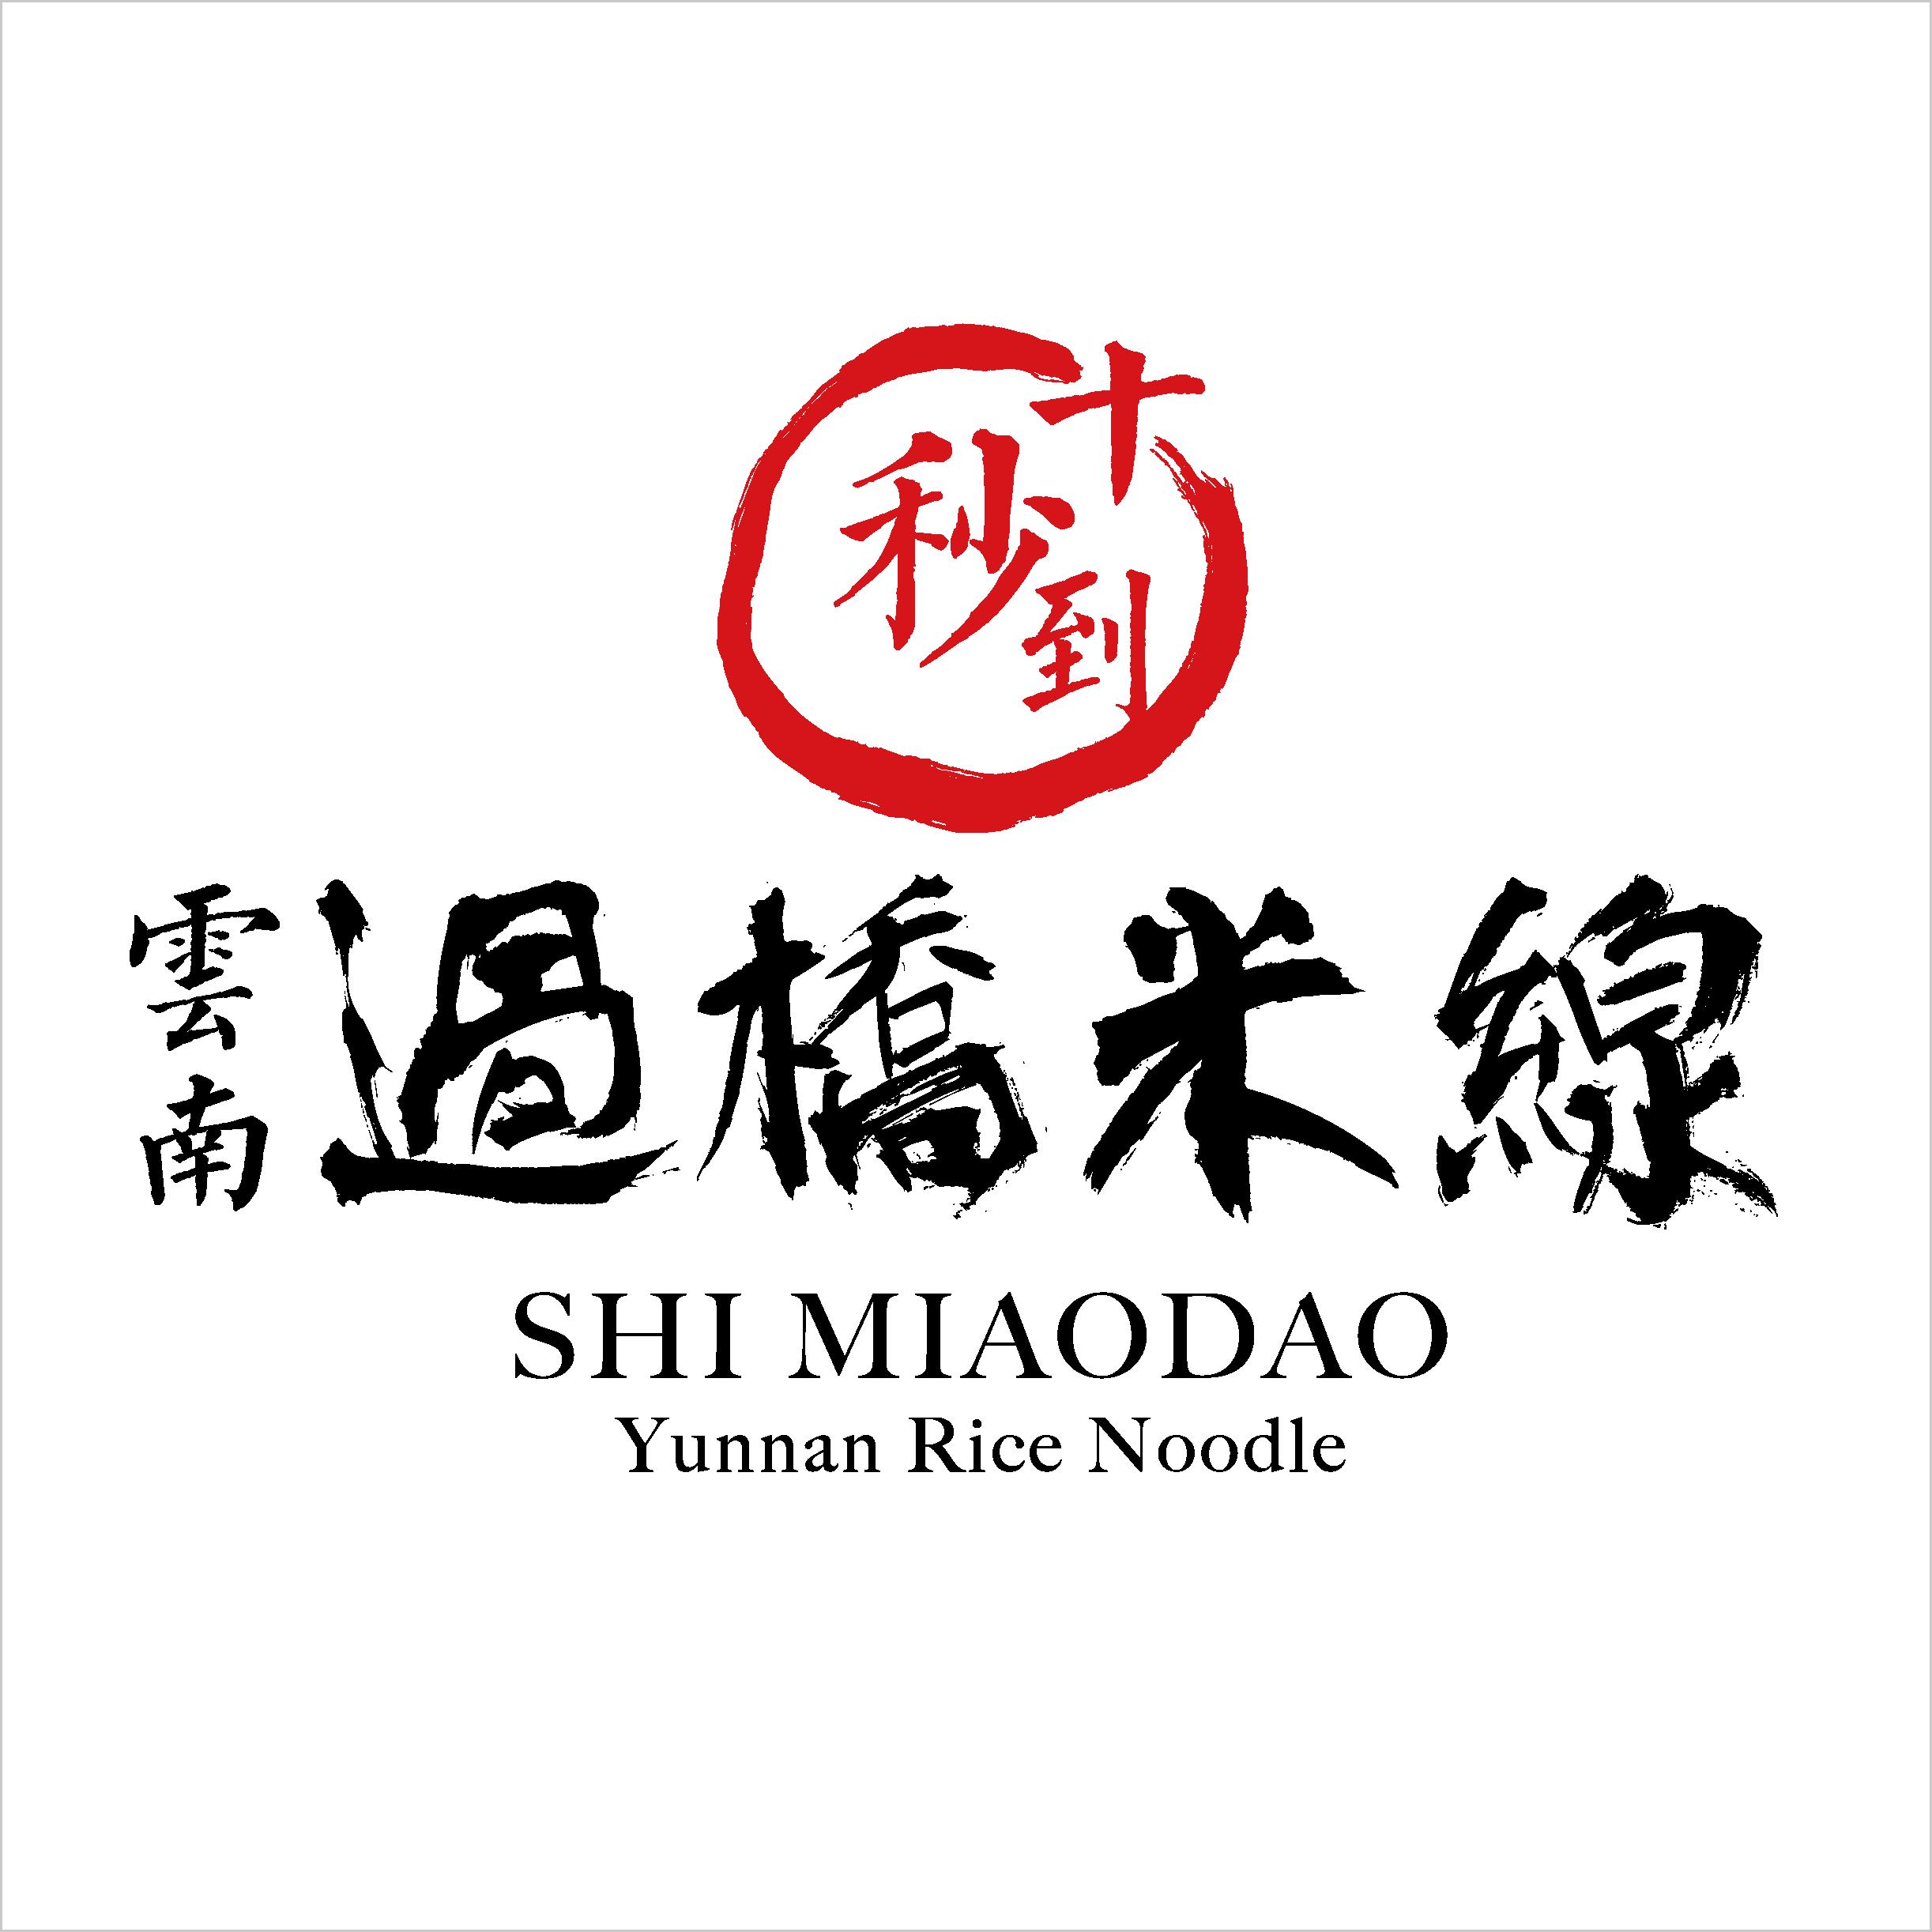 十(shi)秒到jie)頗廈mi)線